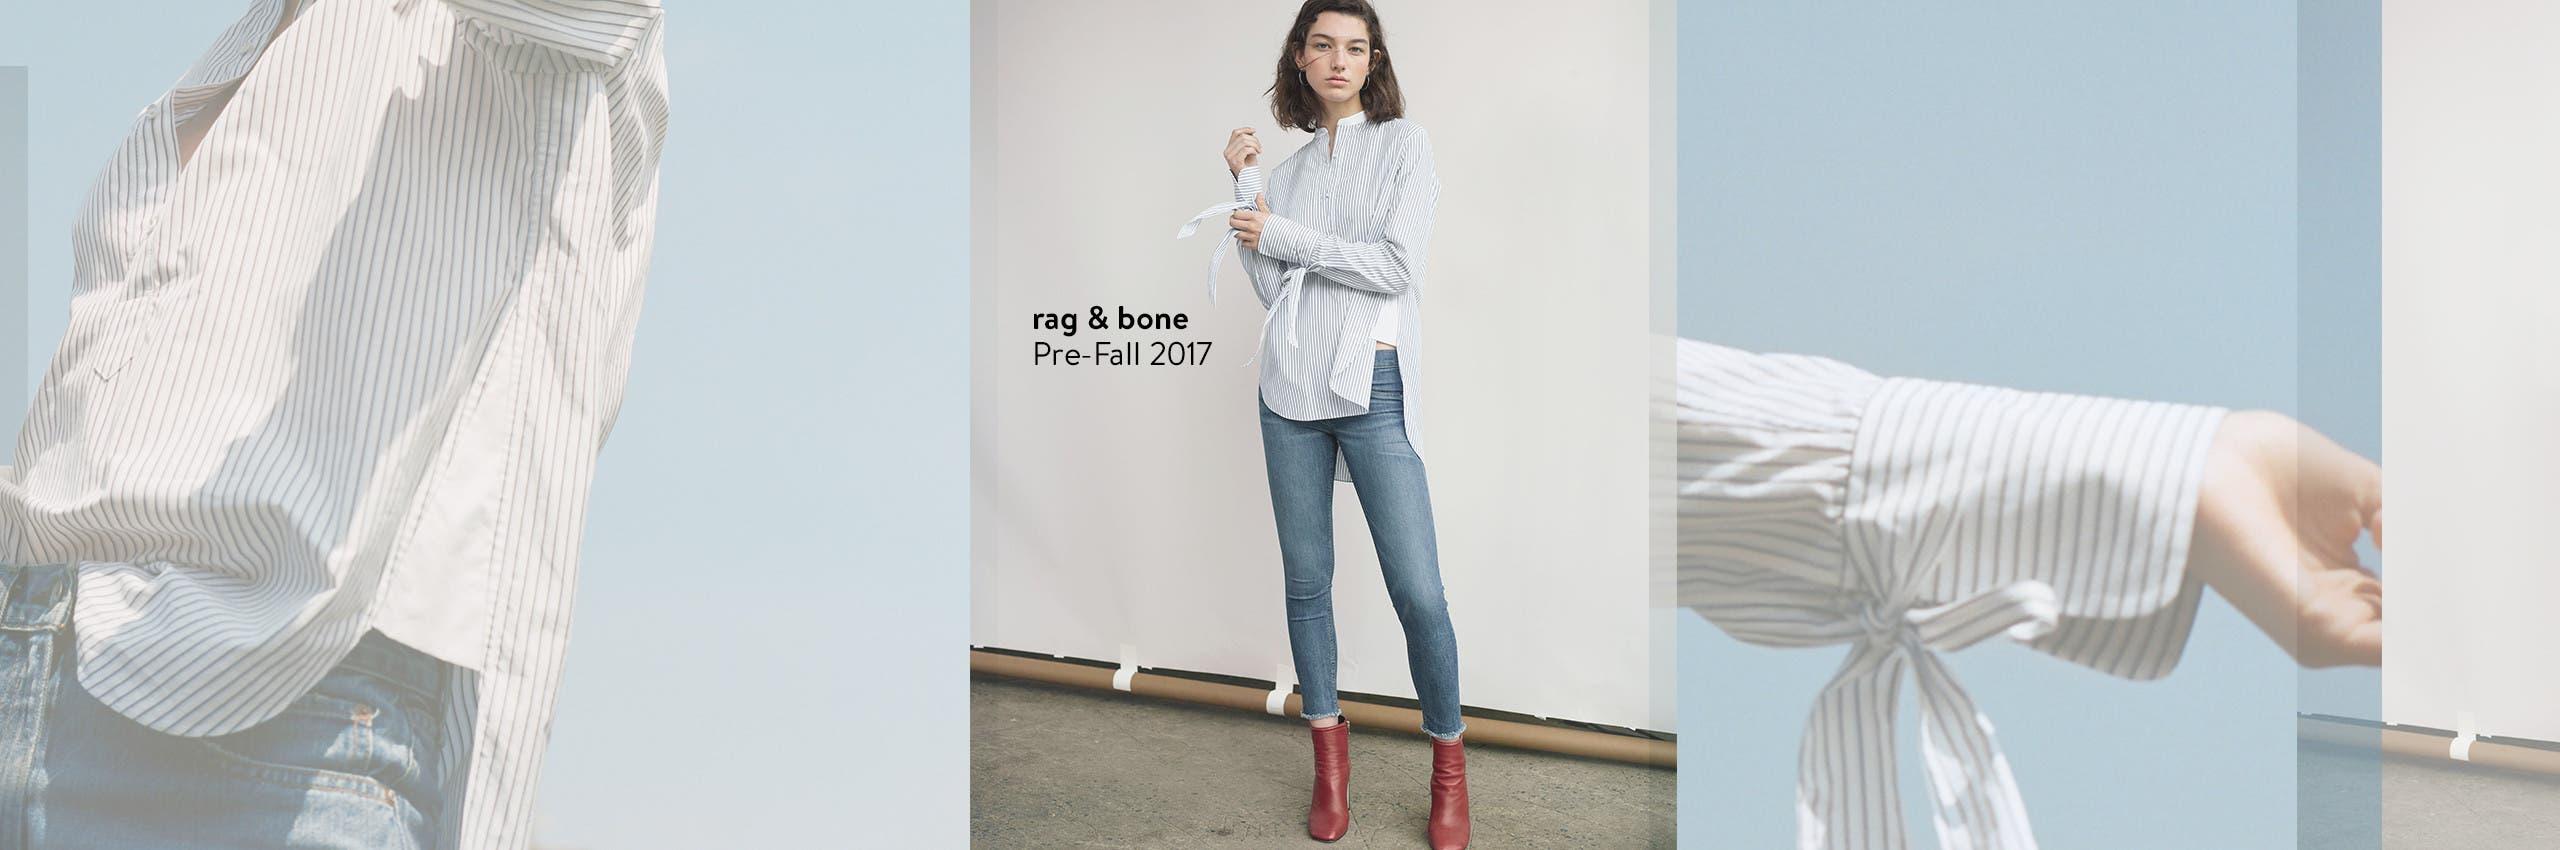 rag & bone for women, fall 2017.